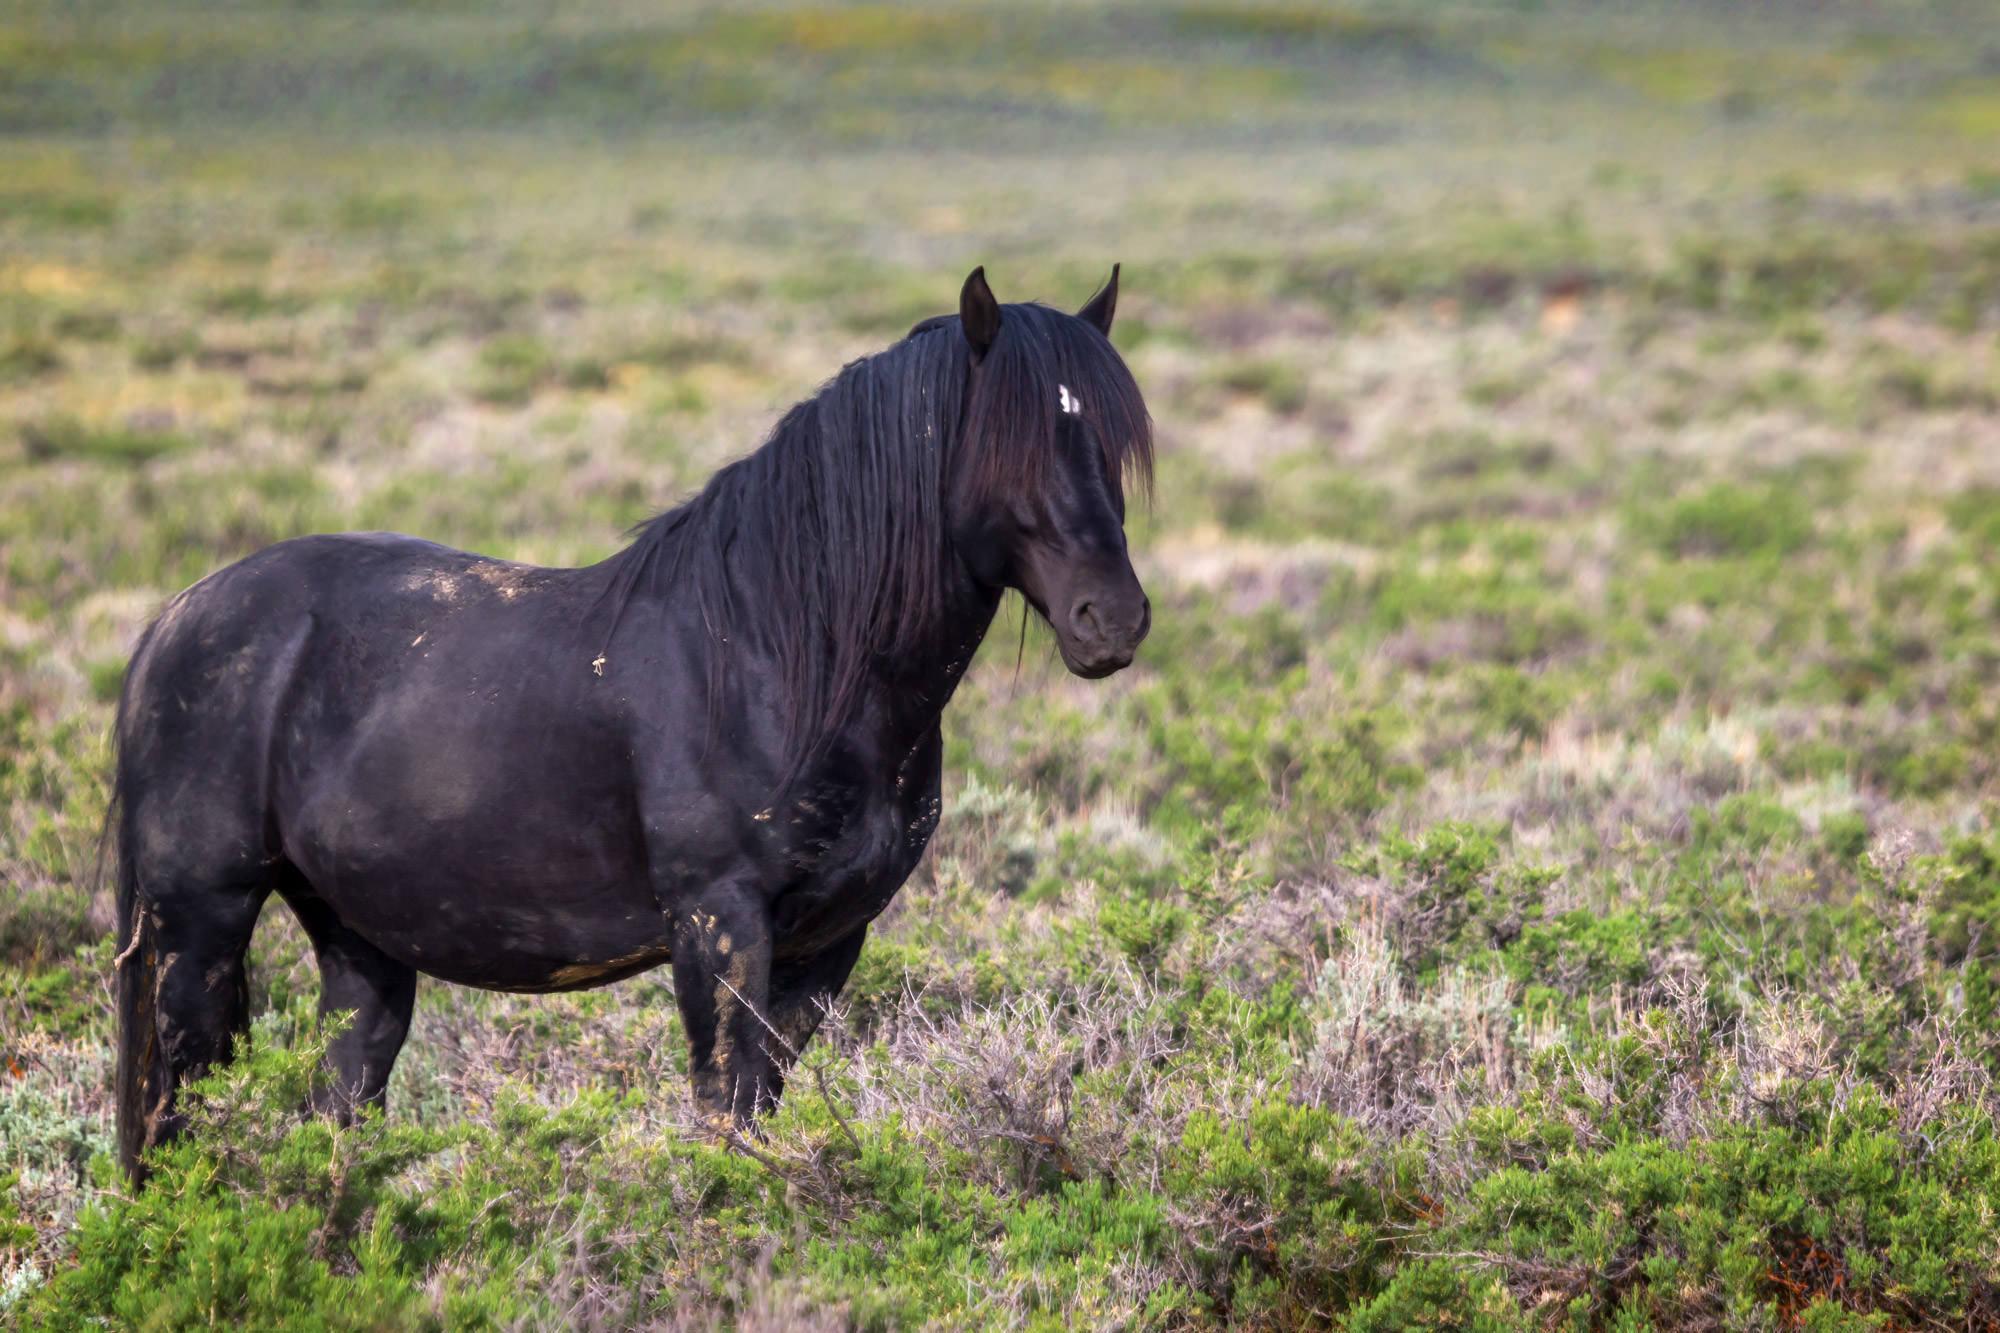 Horse, Wild Horse, Wyoming, limited edition, photograph fine art, wildlife, photo